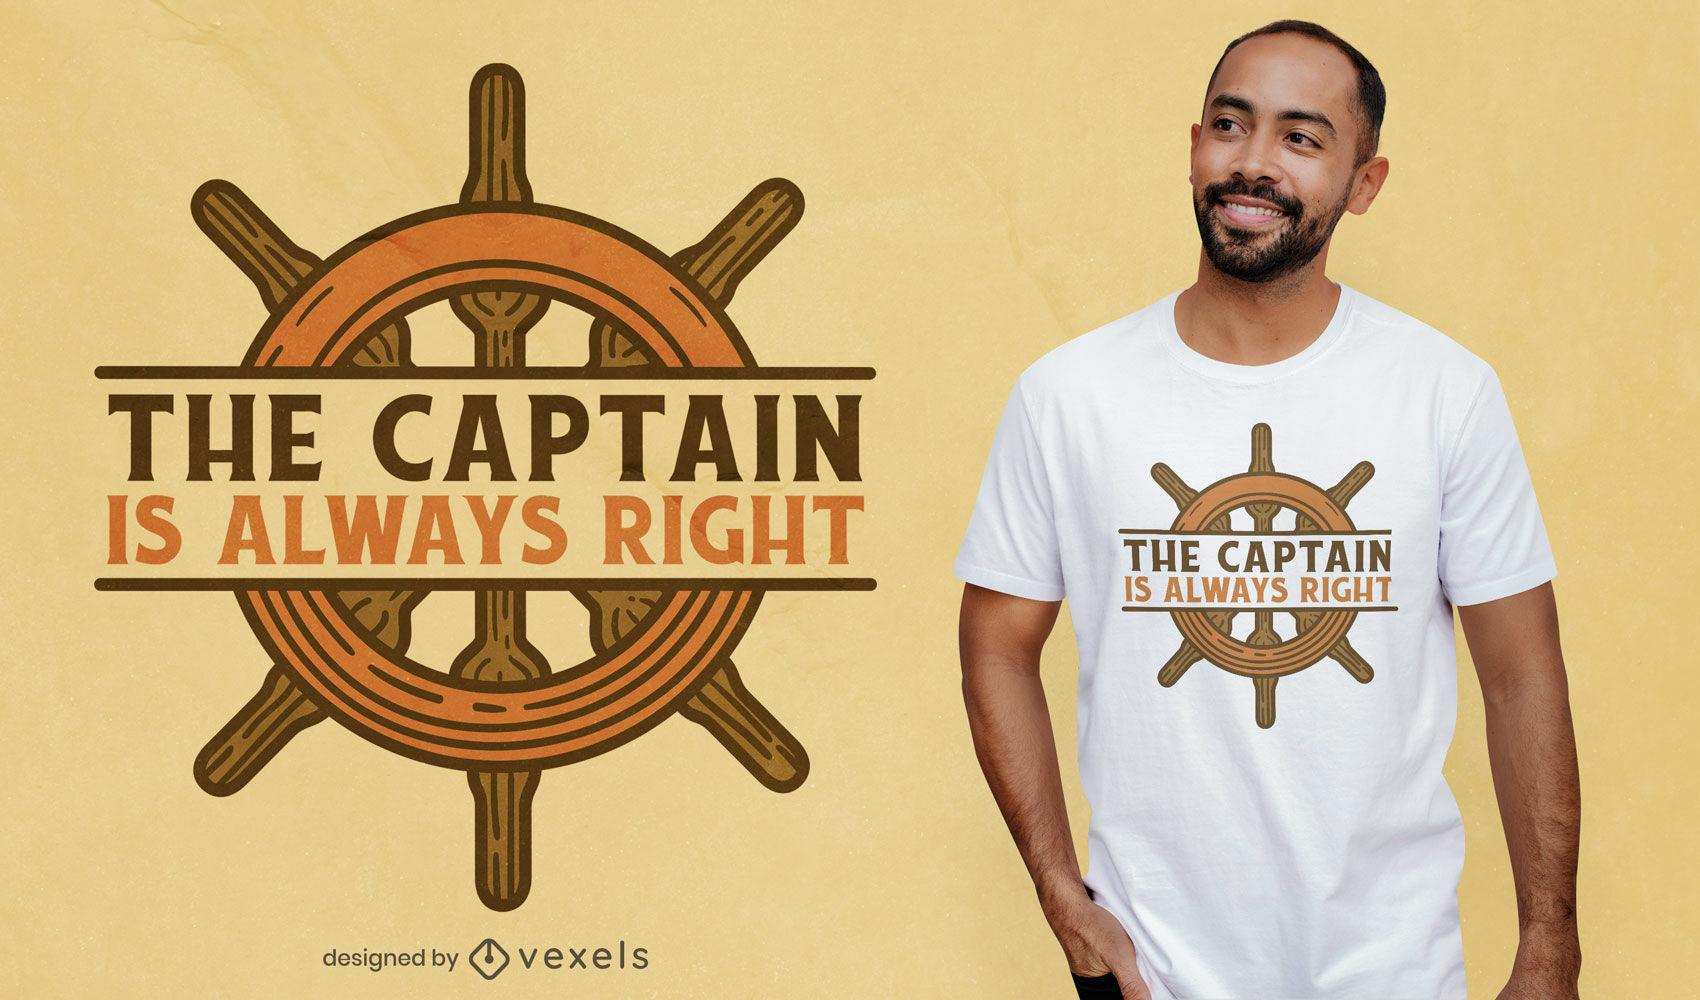 Captain ship wheel quote t-shirt design